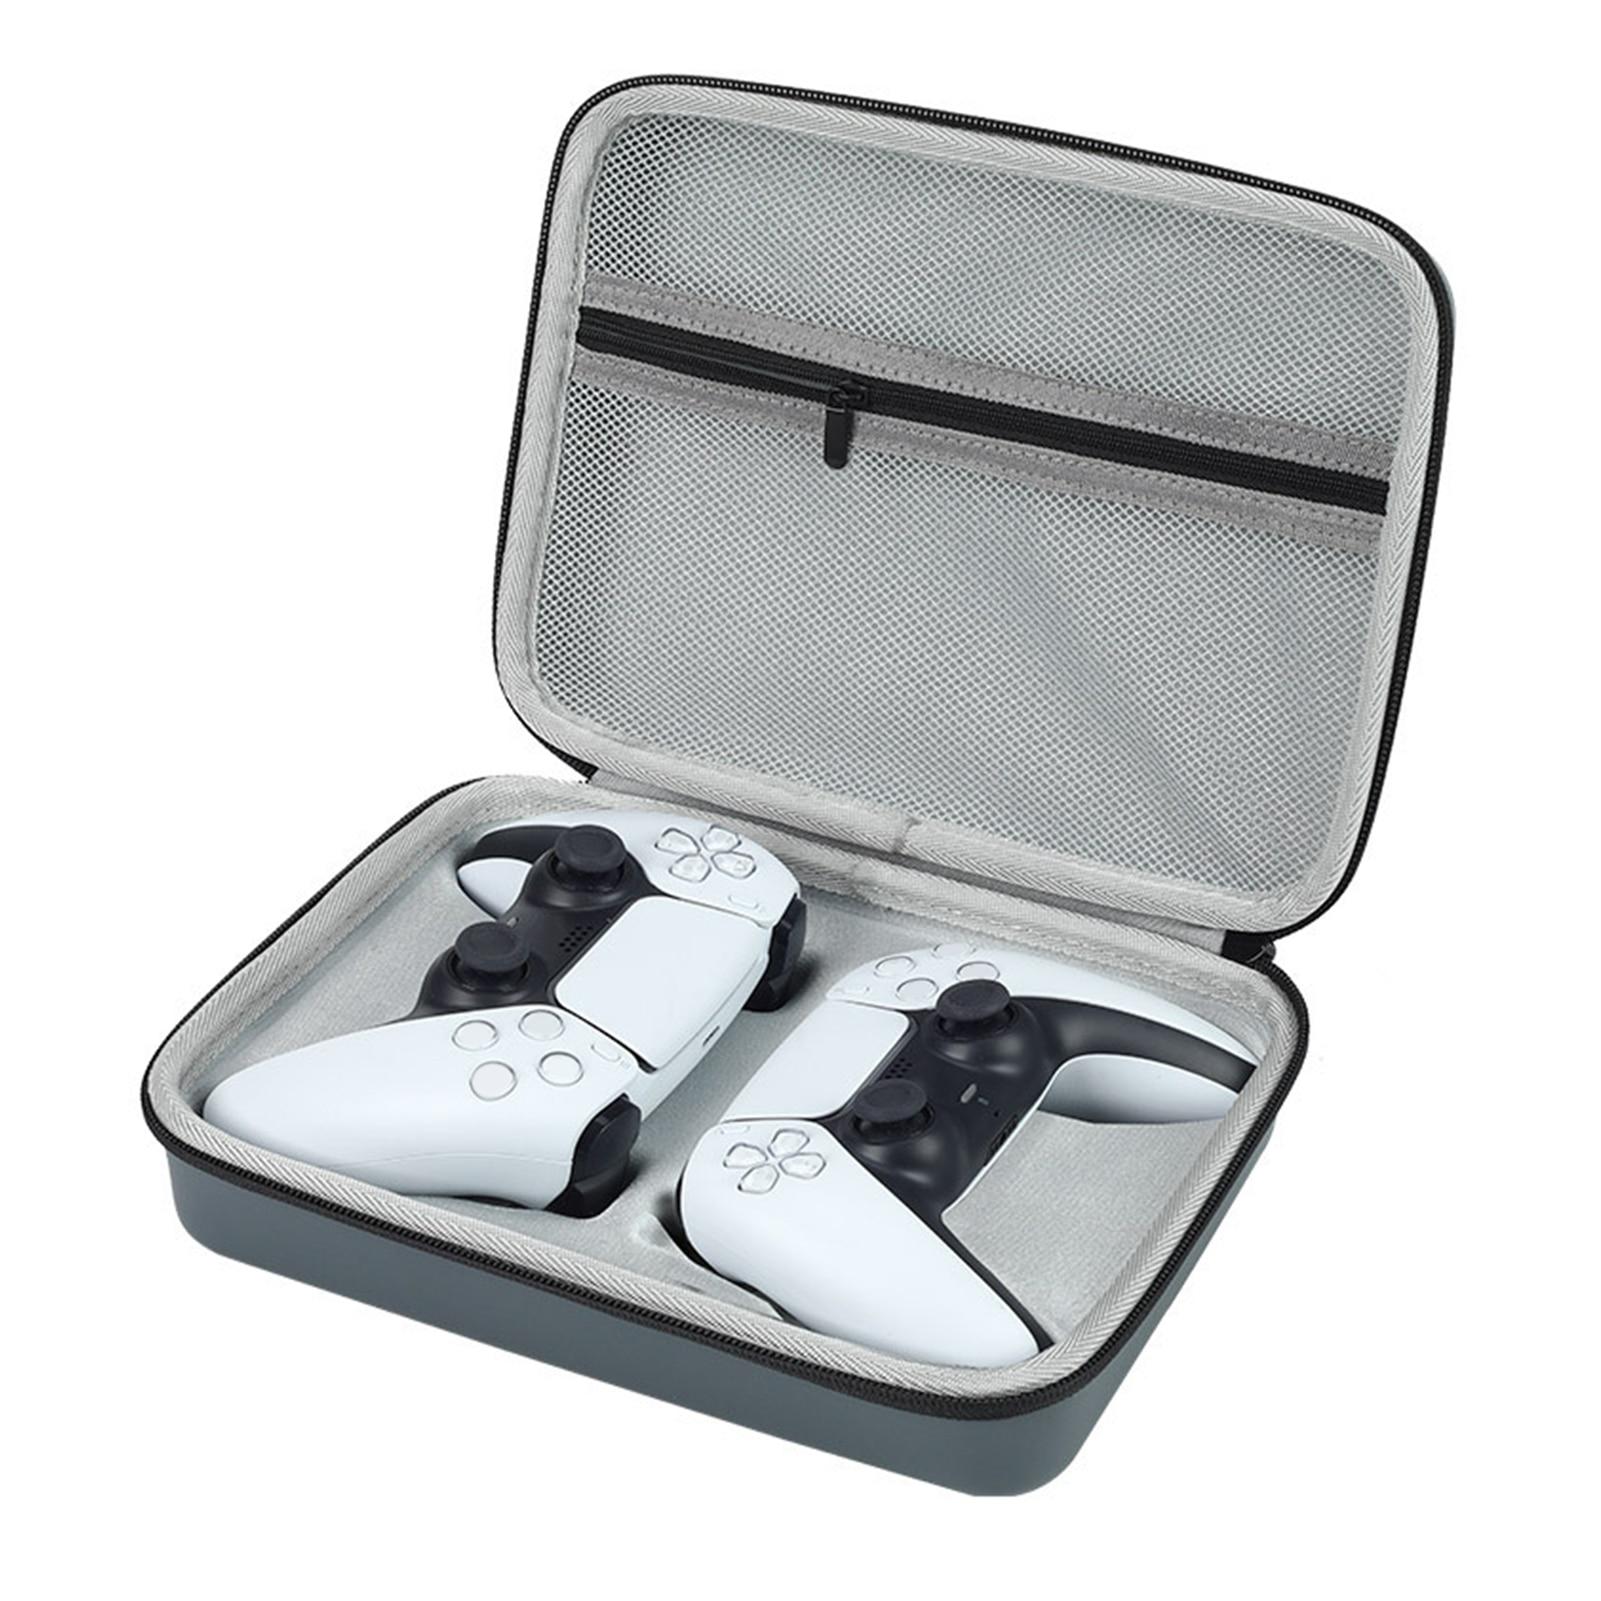 Portátil EVA Treval bolsa de almacenamiento de Estuche de transporte para PS5 PS4 Doble controlador de Shell protectora a prueba de golpes para PS5 /4 Gamepad